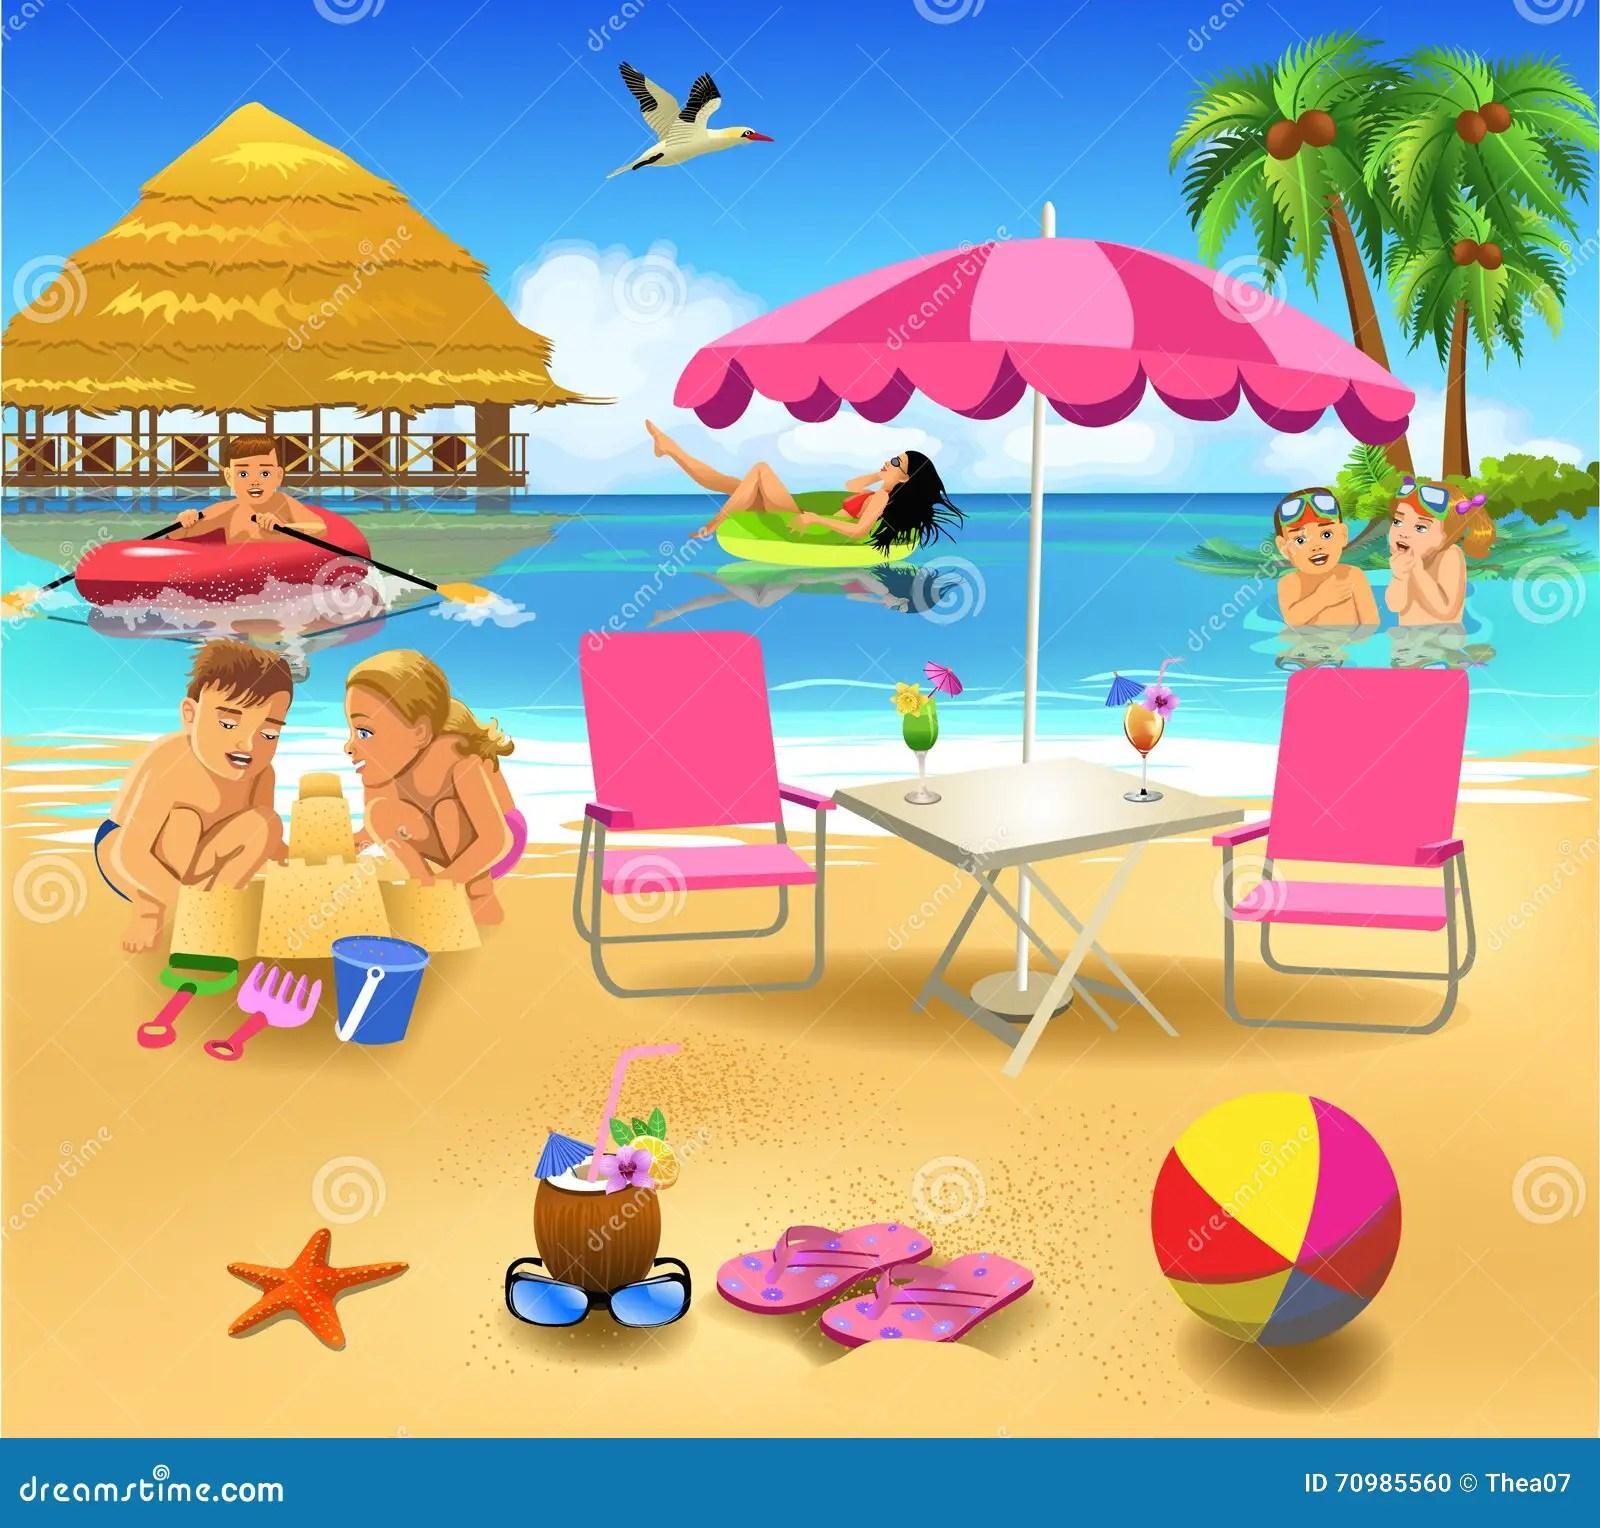 People Having Fun On Summer Vacation Stock Vector Illustration Of Cartoon Elements 70985560